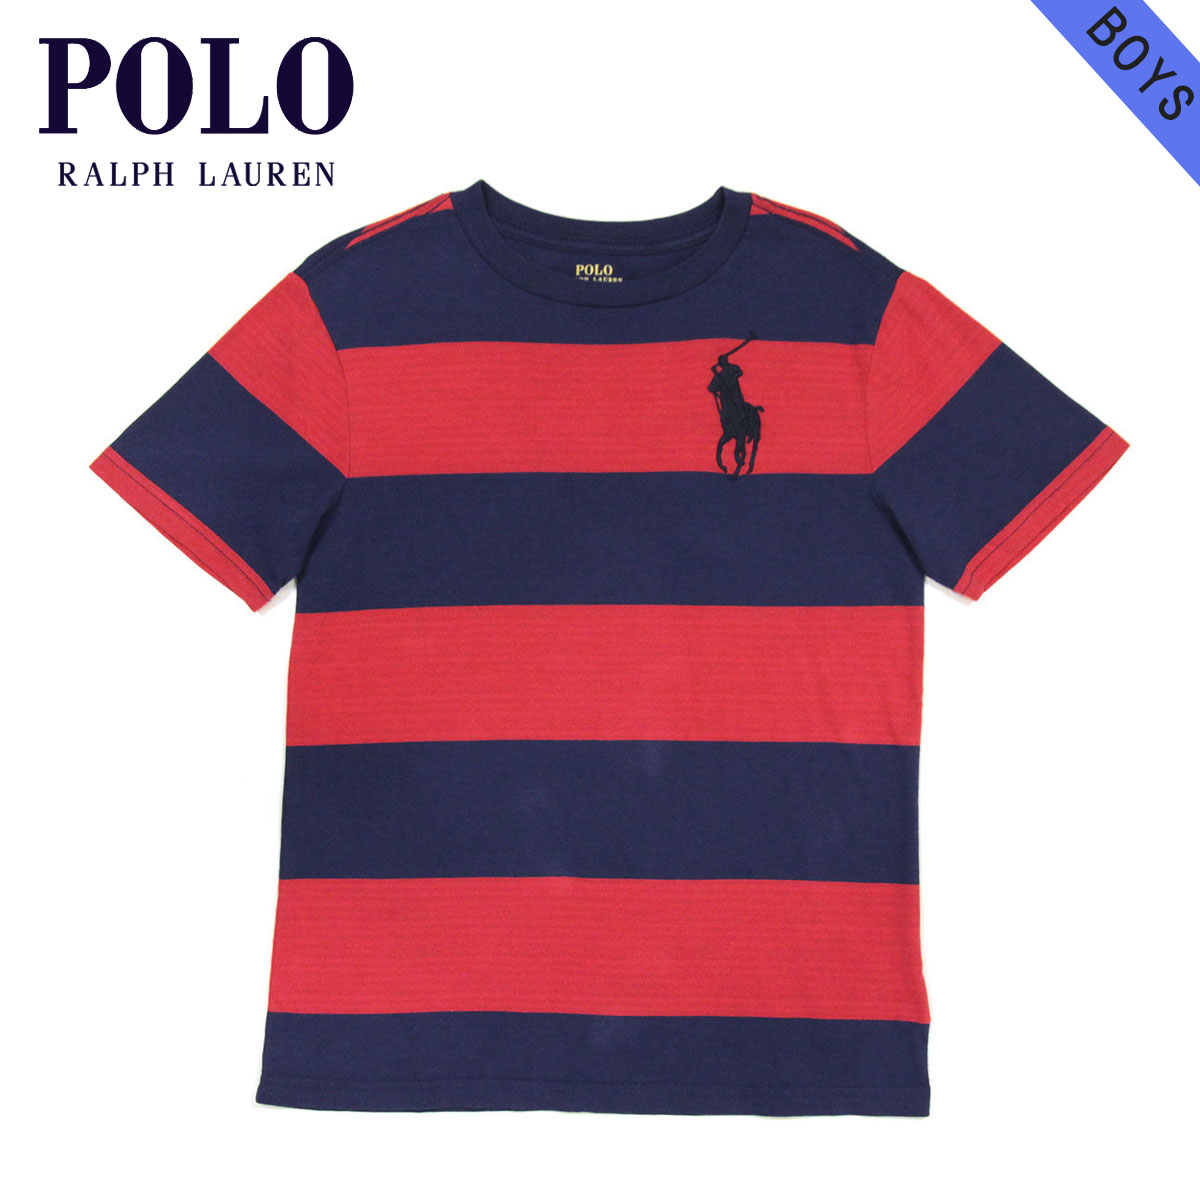 b97bb538 Polo Ralph Lauren kids POLO RALPH LAUREN CHILDREN regular article children's  clothes Boys big pony short ...